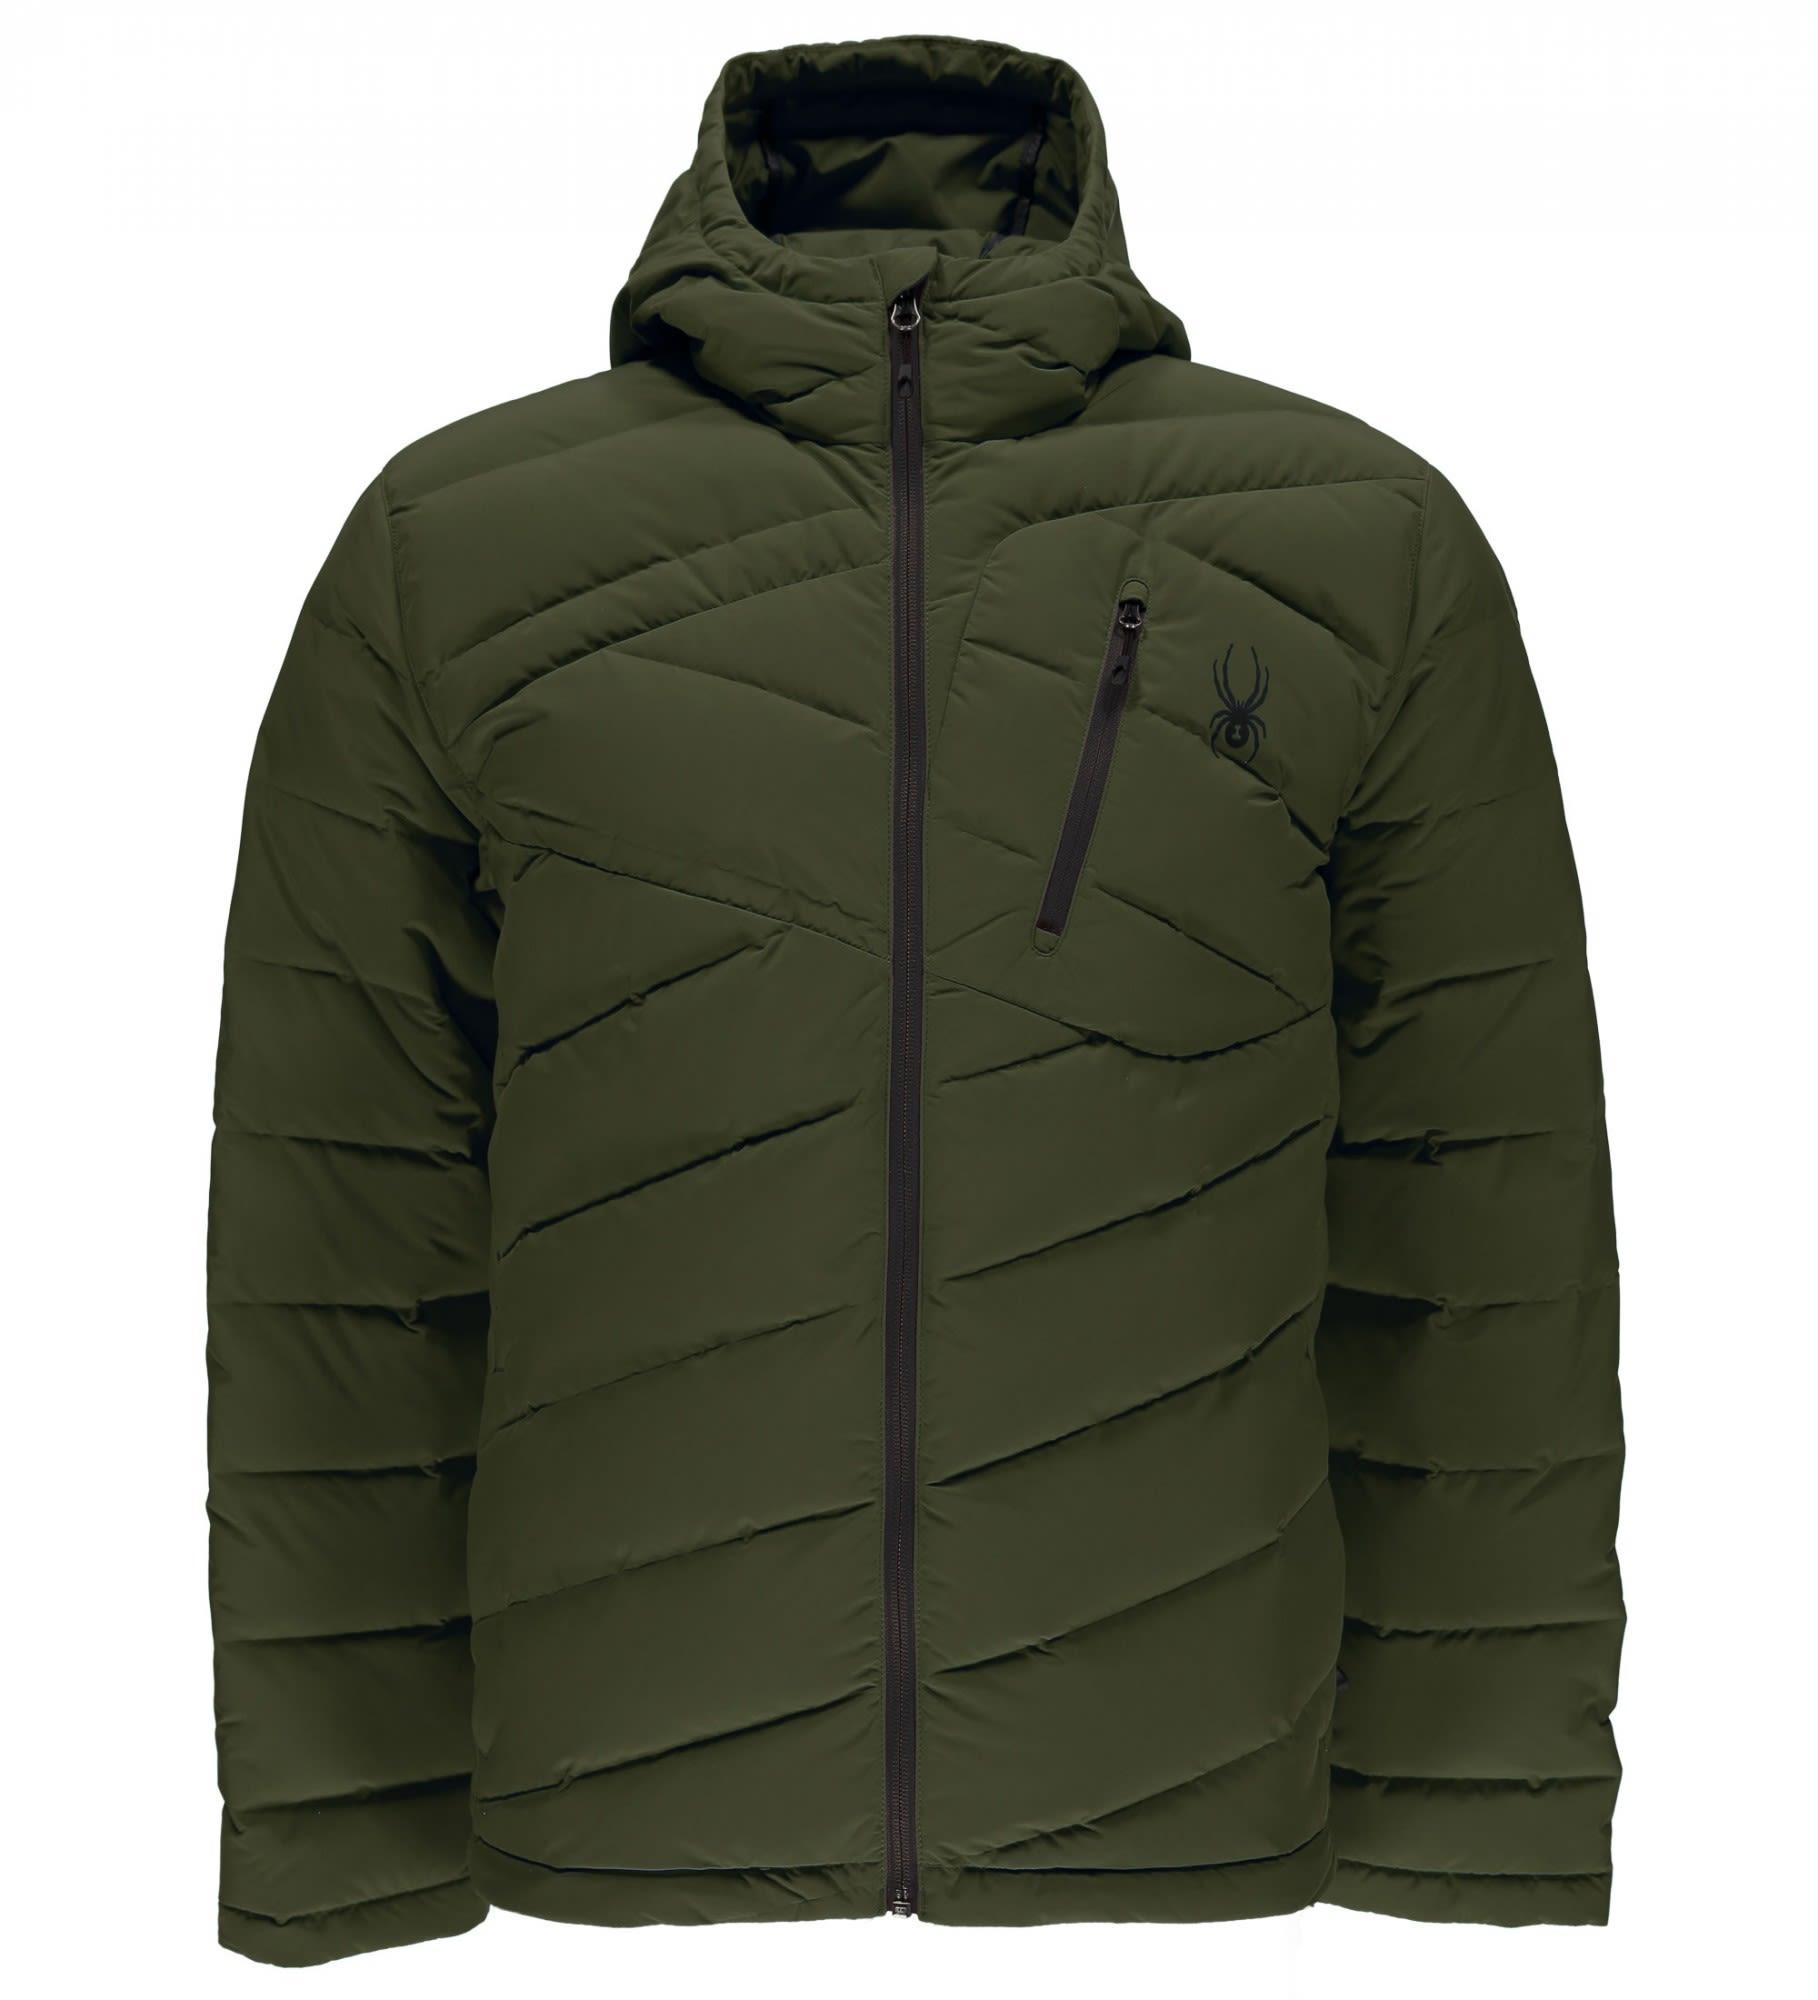 Spyder Syrround Hoody Down Jacket (Modell Winter 2017) Grün, Male Daunen Daunen